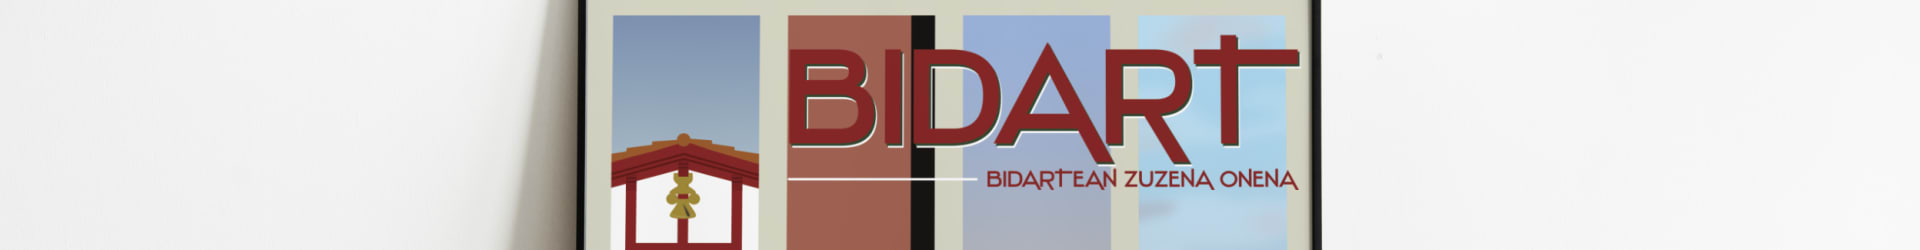 BIDART – Côte Basque